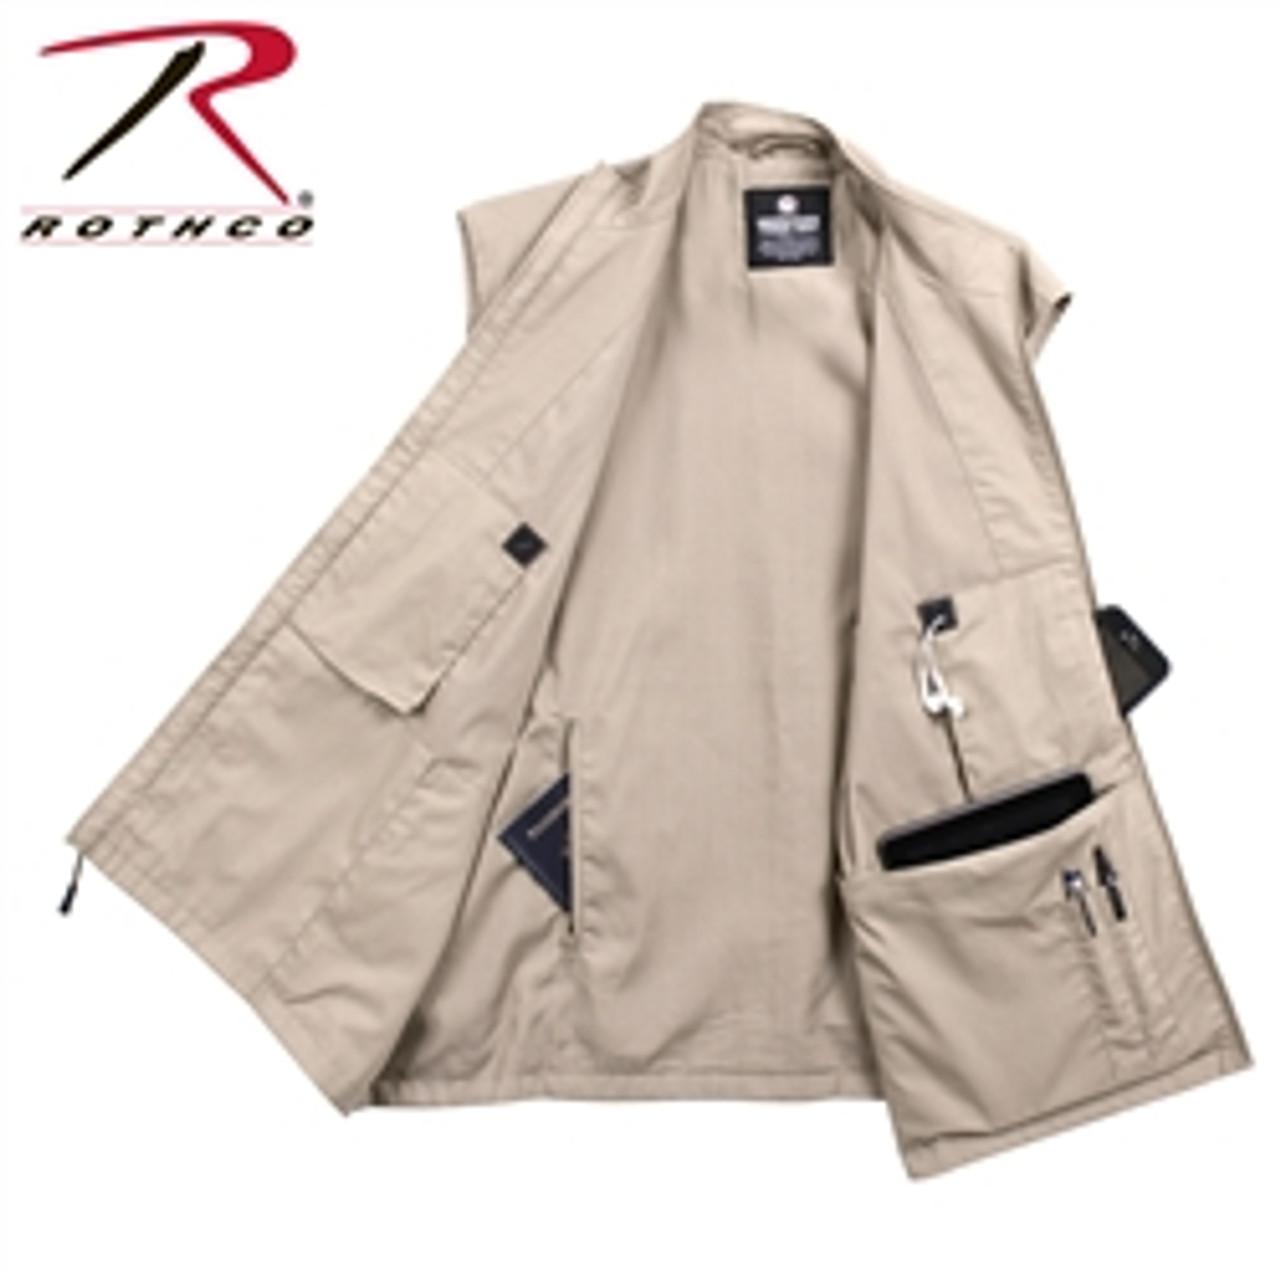 Undercover Travel Vest